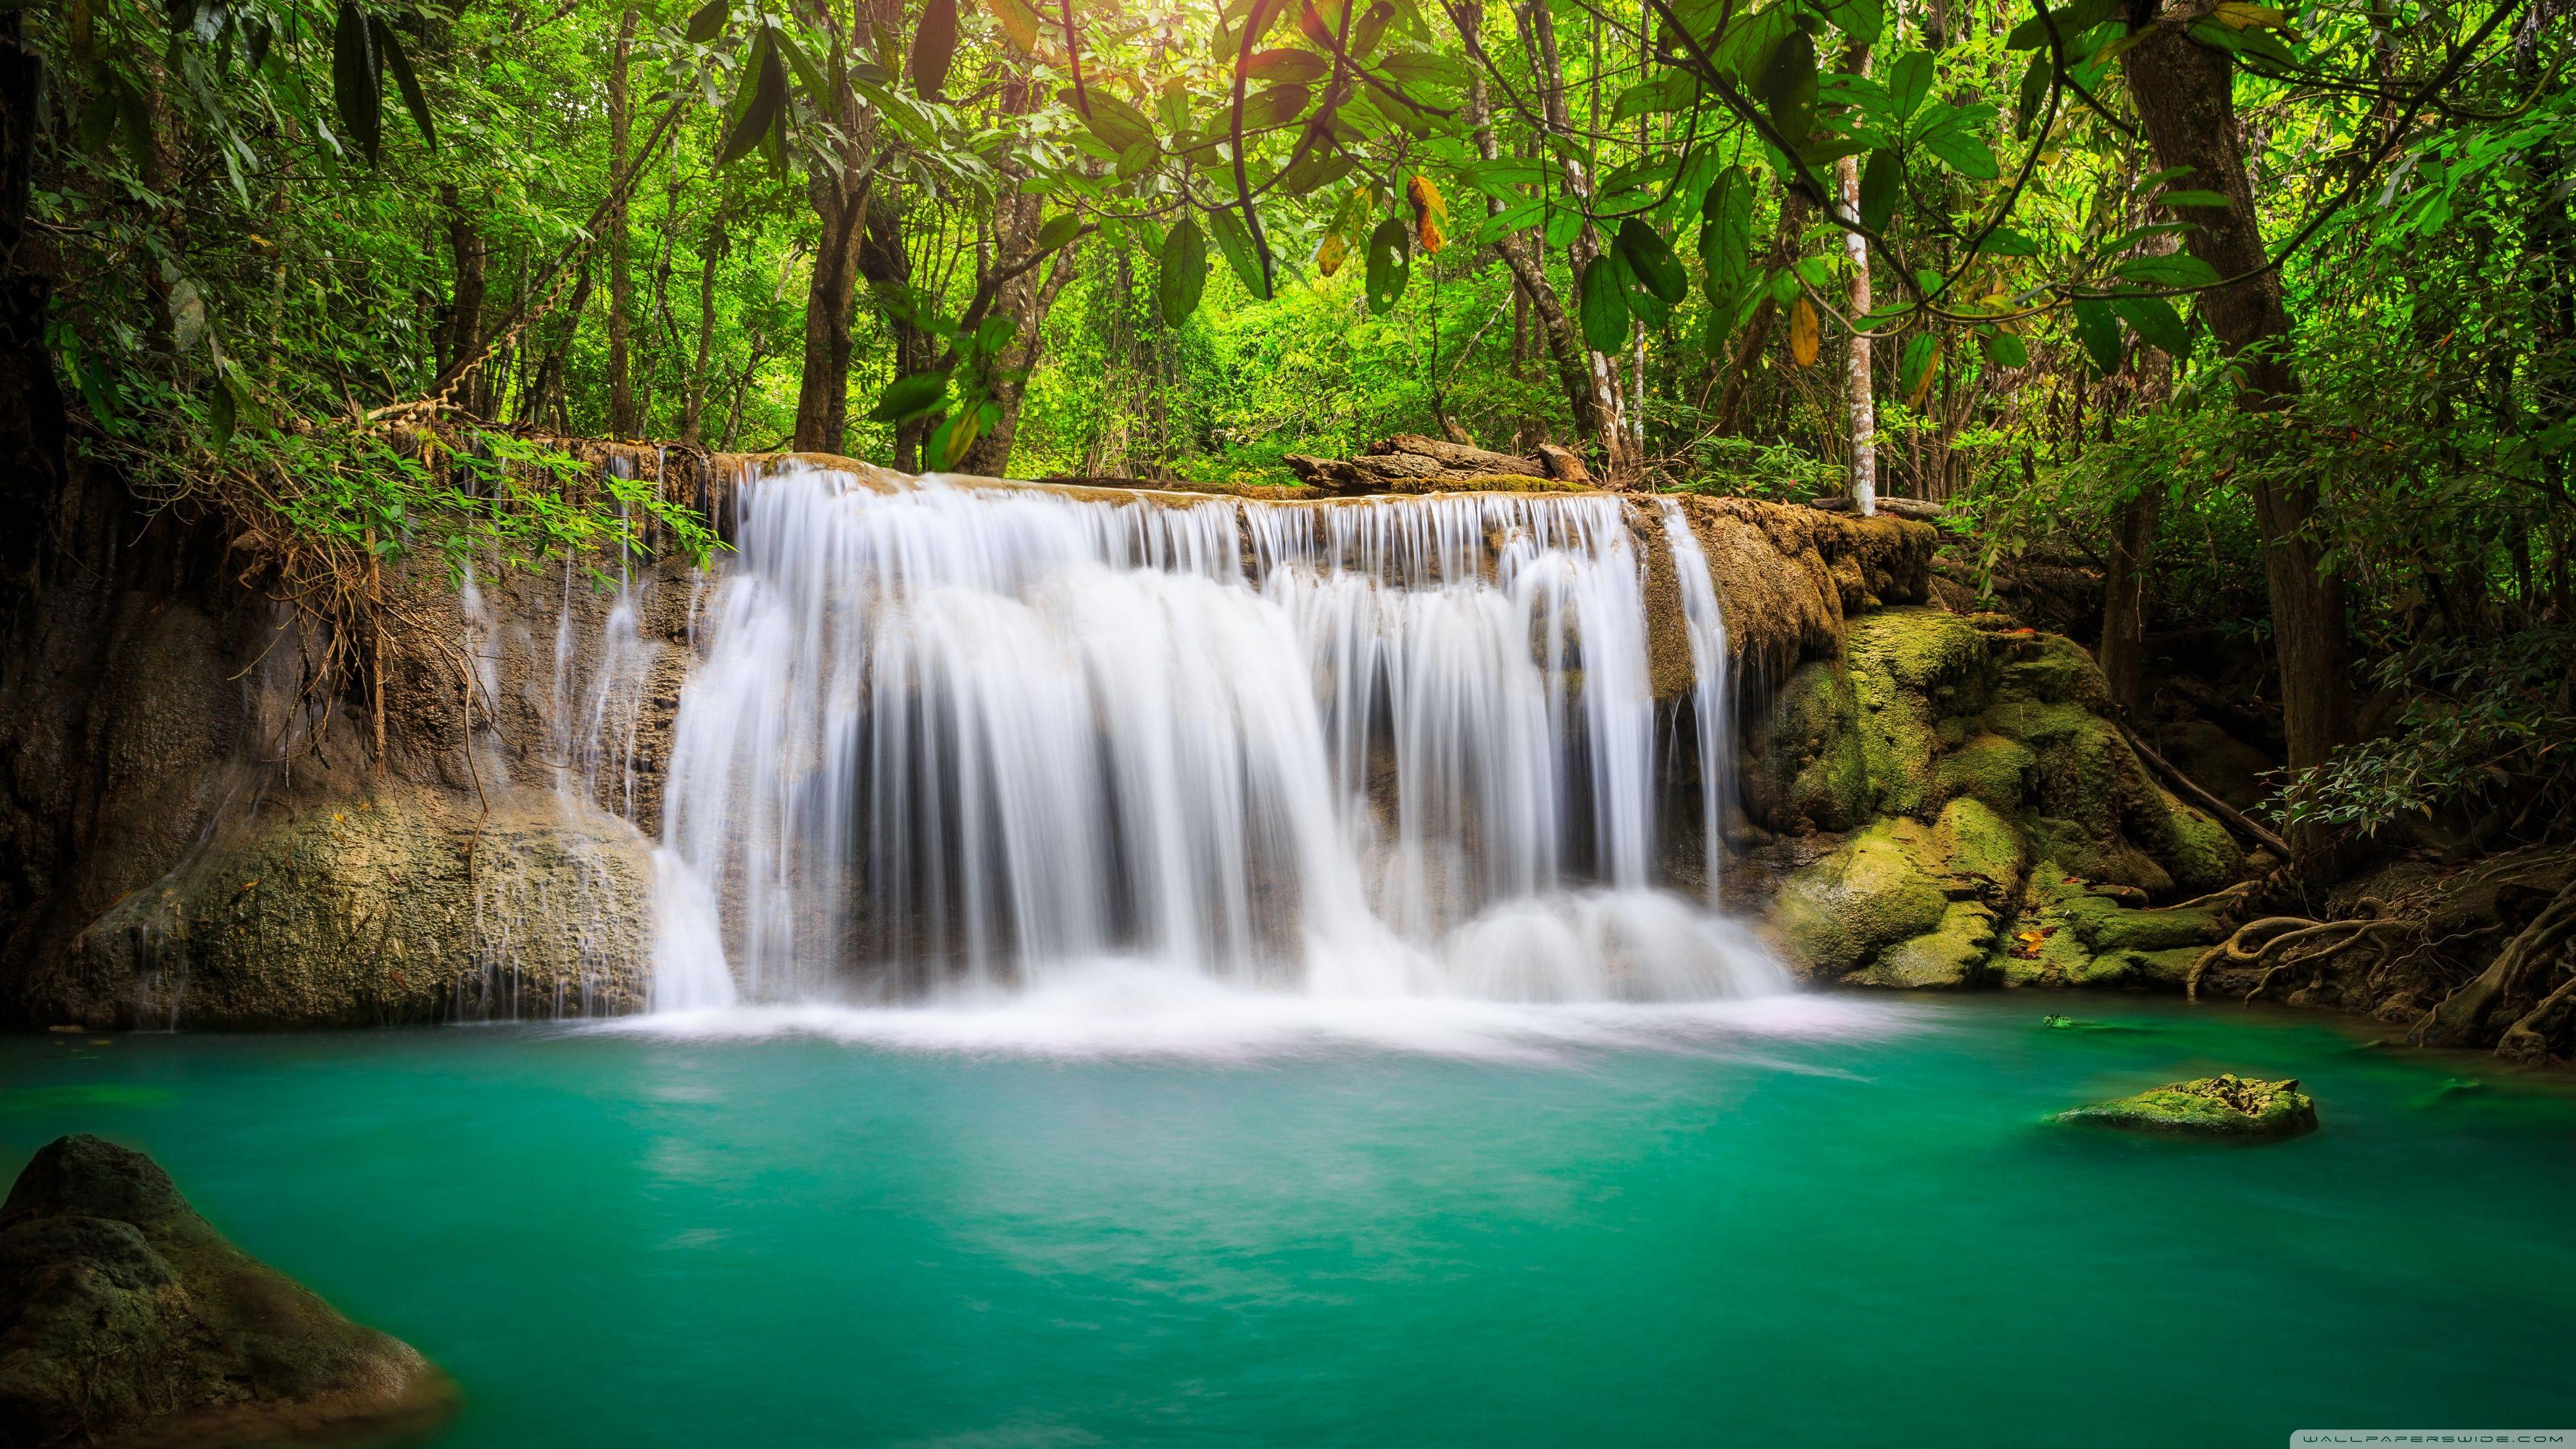 Rainforest Waterfall Wallpapers Wallpaper Cave